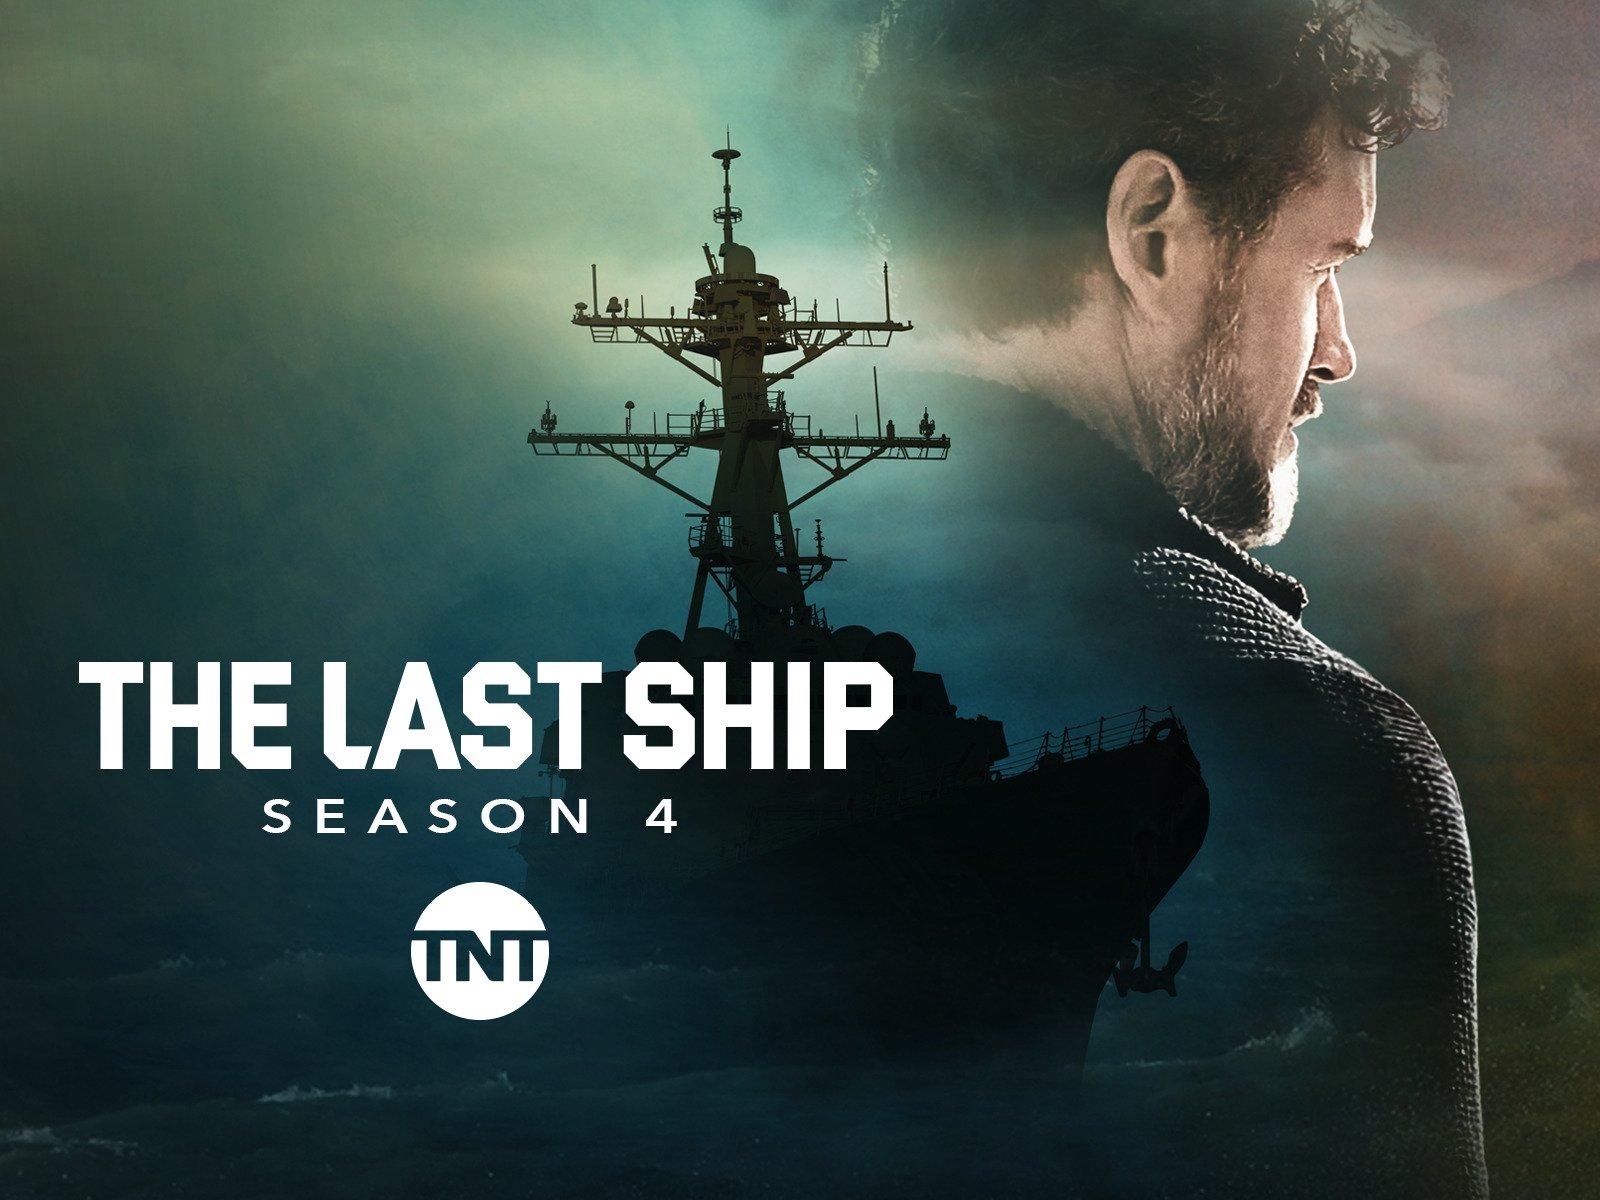 The Last Ship Season 4 ฐานทัพสุดท้าย เชื้อร้ายถล่มโลก ปี 4 ซับไทย EP1 – EP10 [จบ]